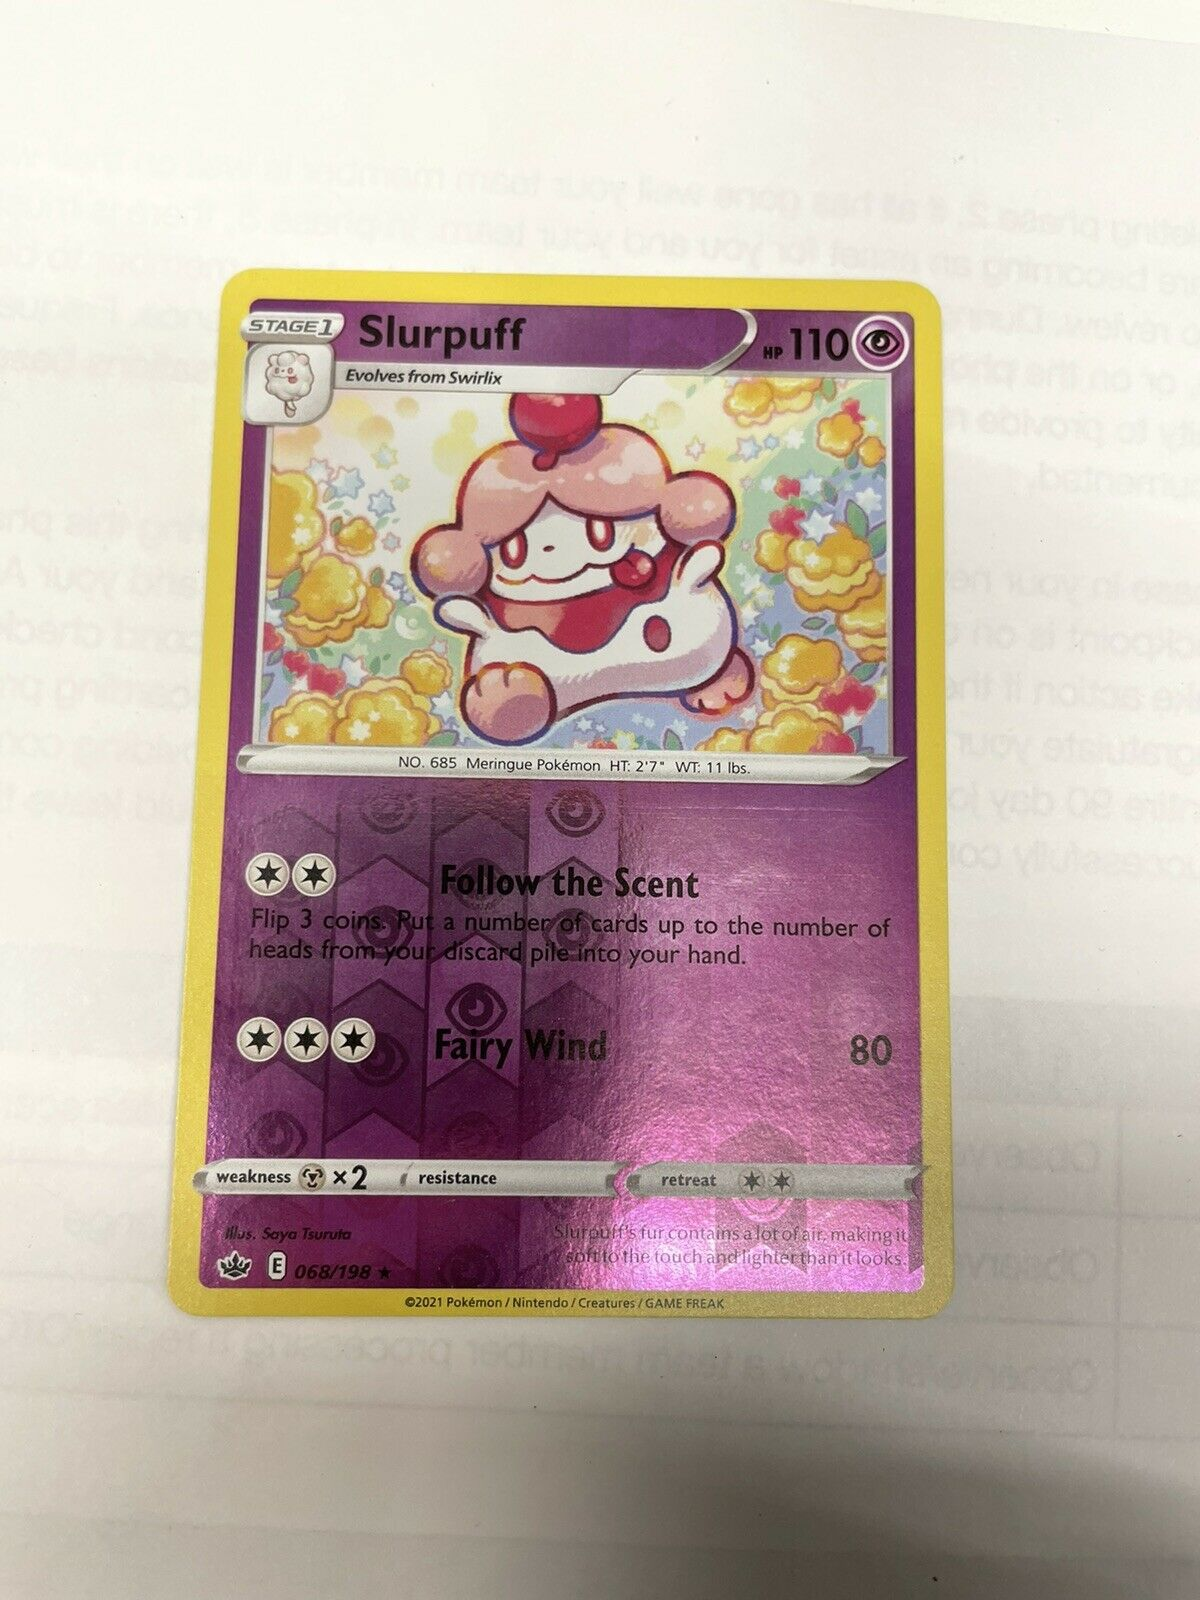 Pokemon TCG Chilling reign reverse holo Slurpuff 068/198 NM